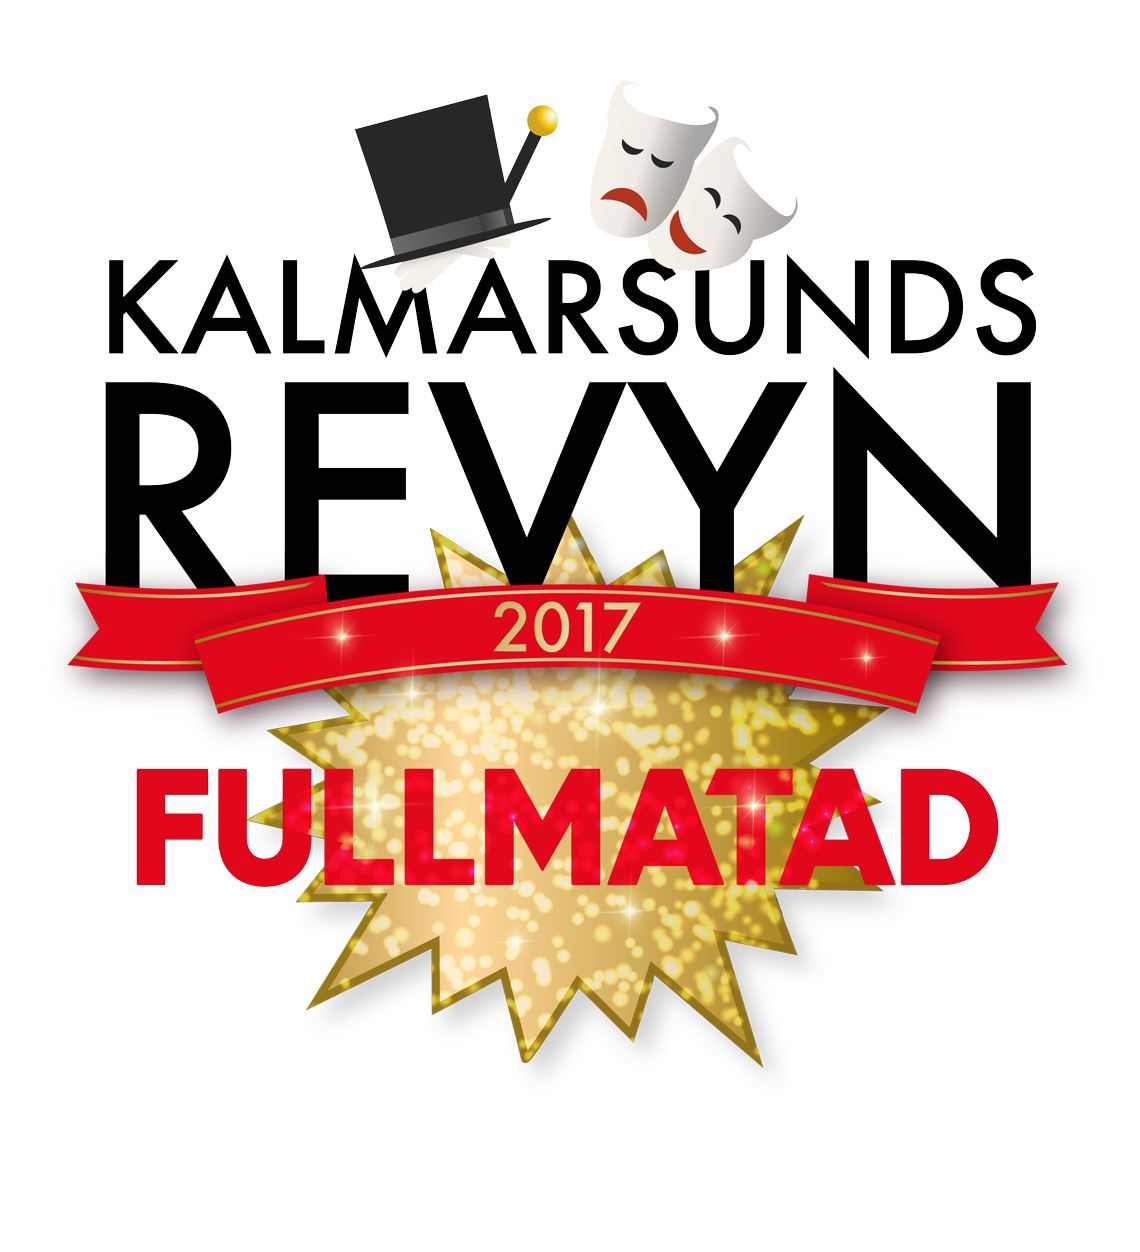 FULLMATAD - Kalmarsundsrevyn 2017